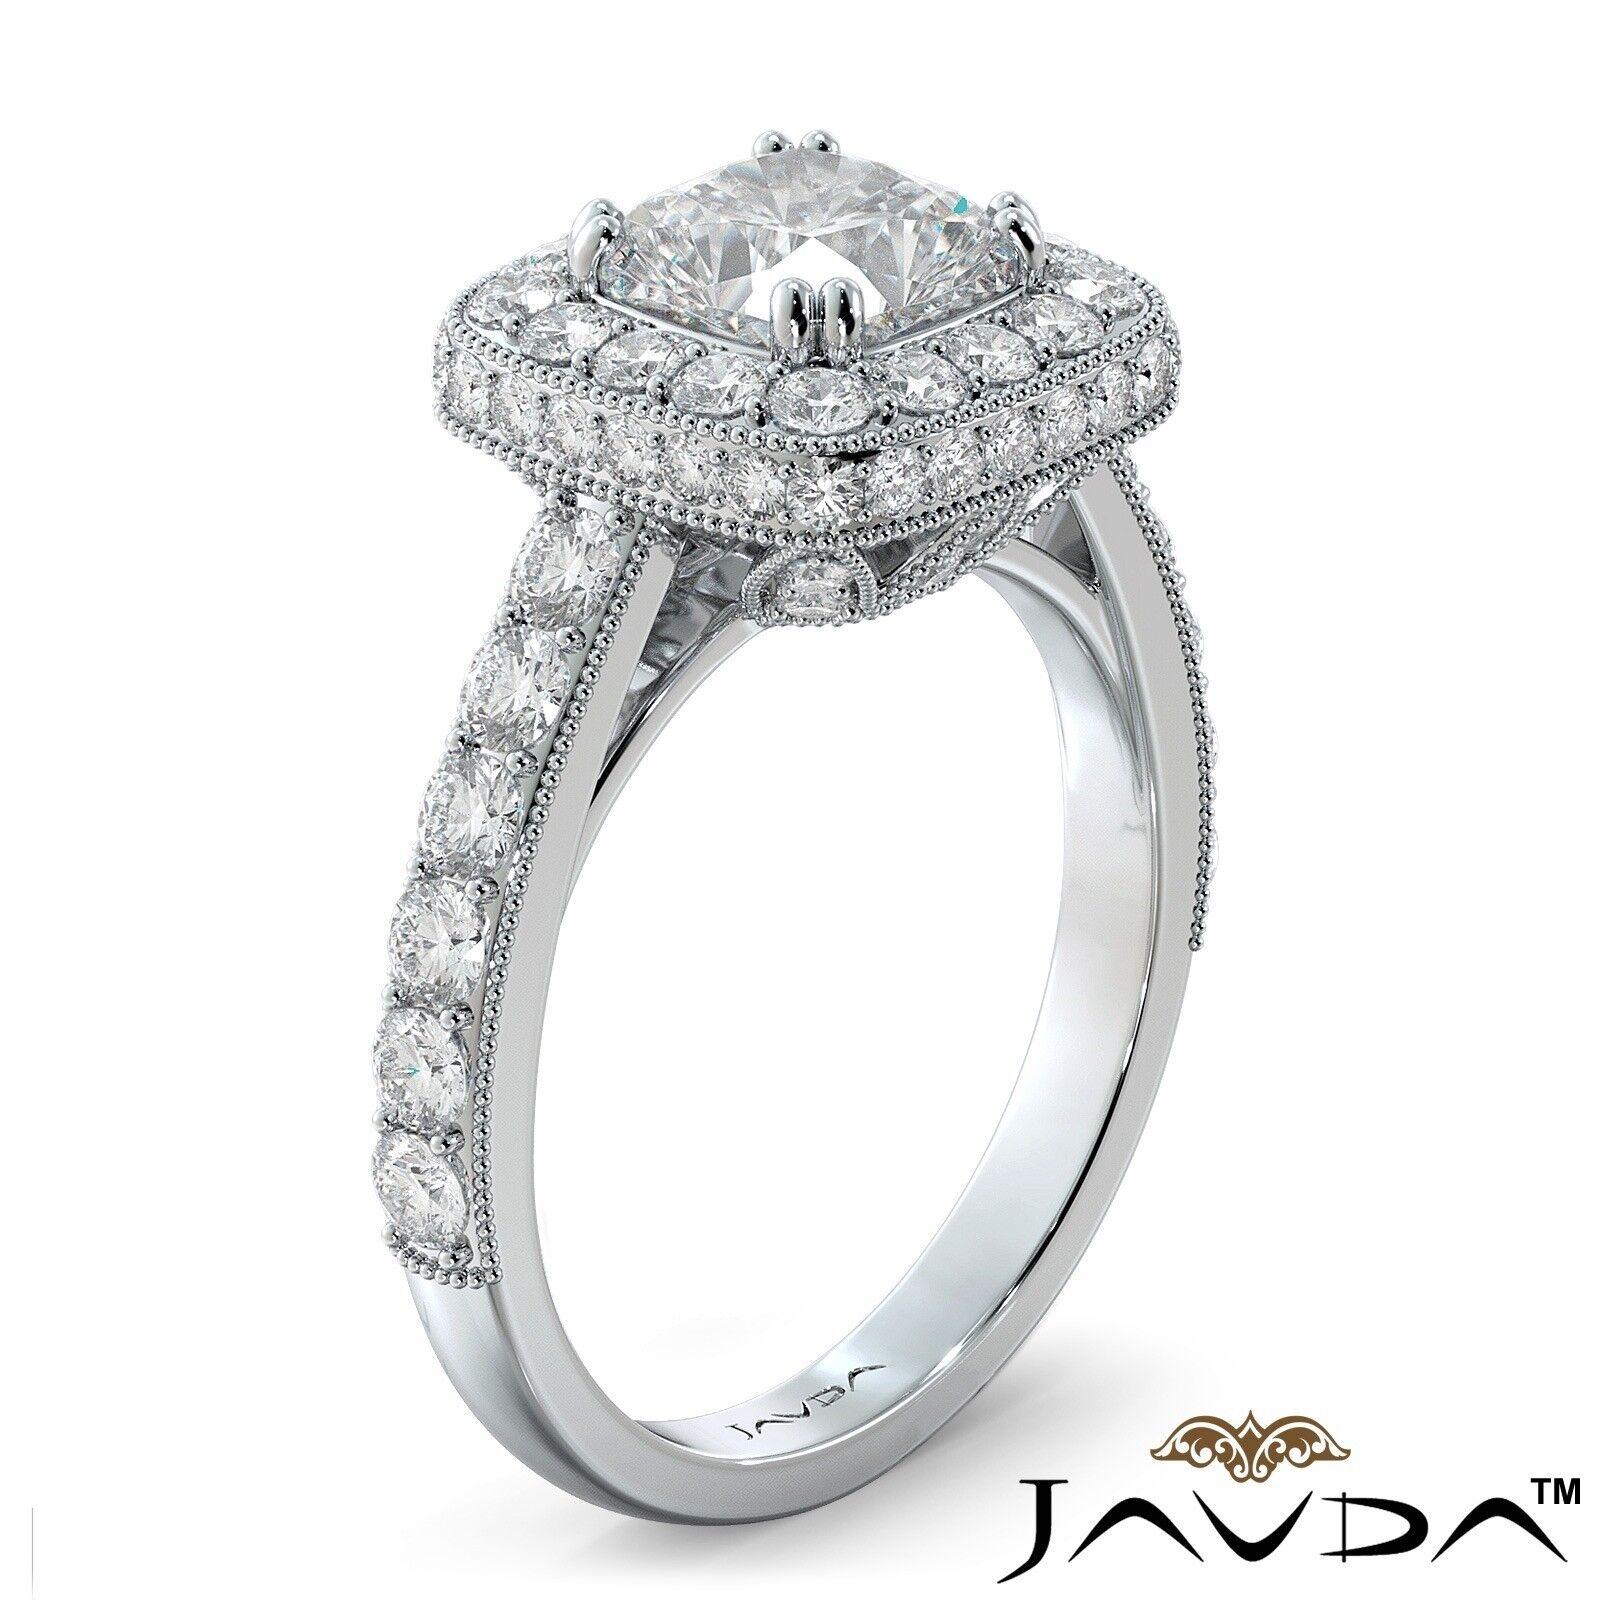 2ctw Milgrain Halo Floral Basket Cushion Diamond Engagement Ring GIA H-VS2 Gold 1